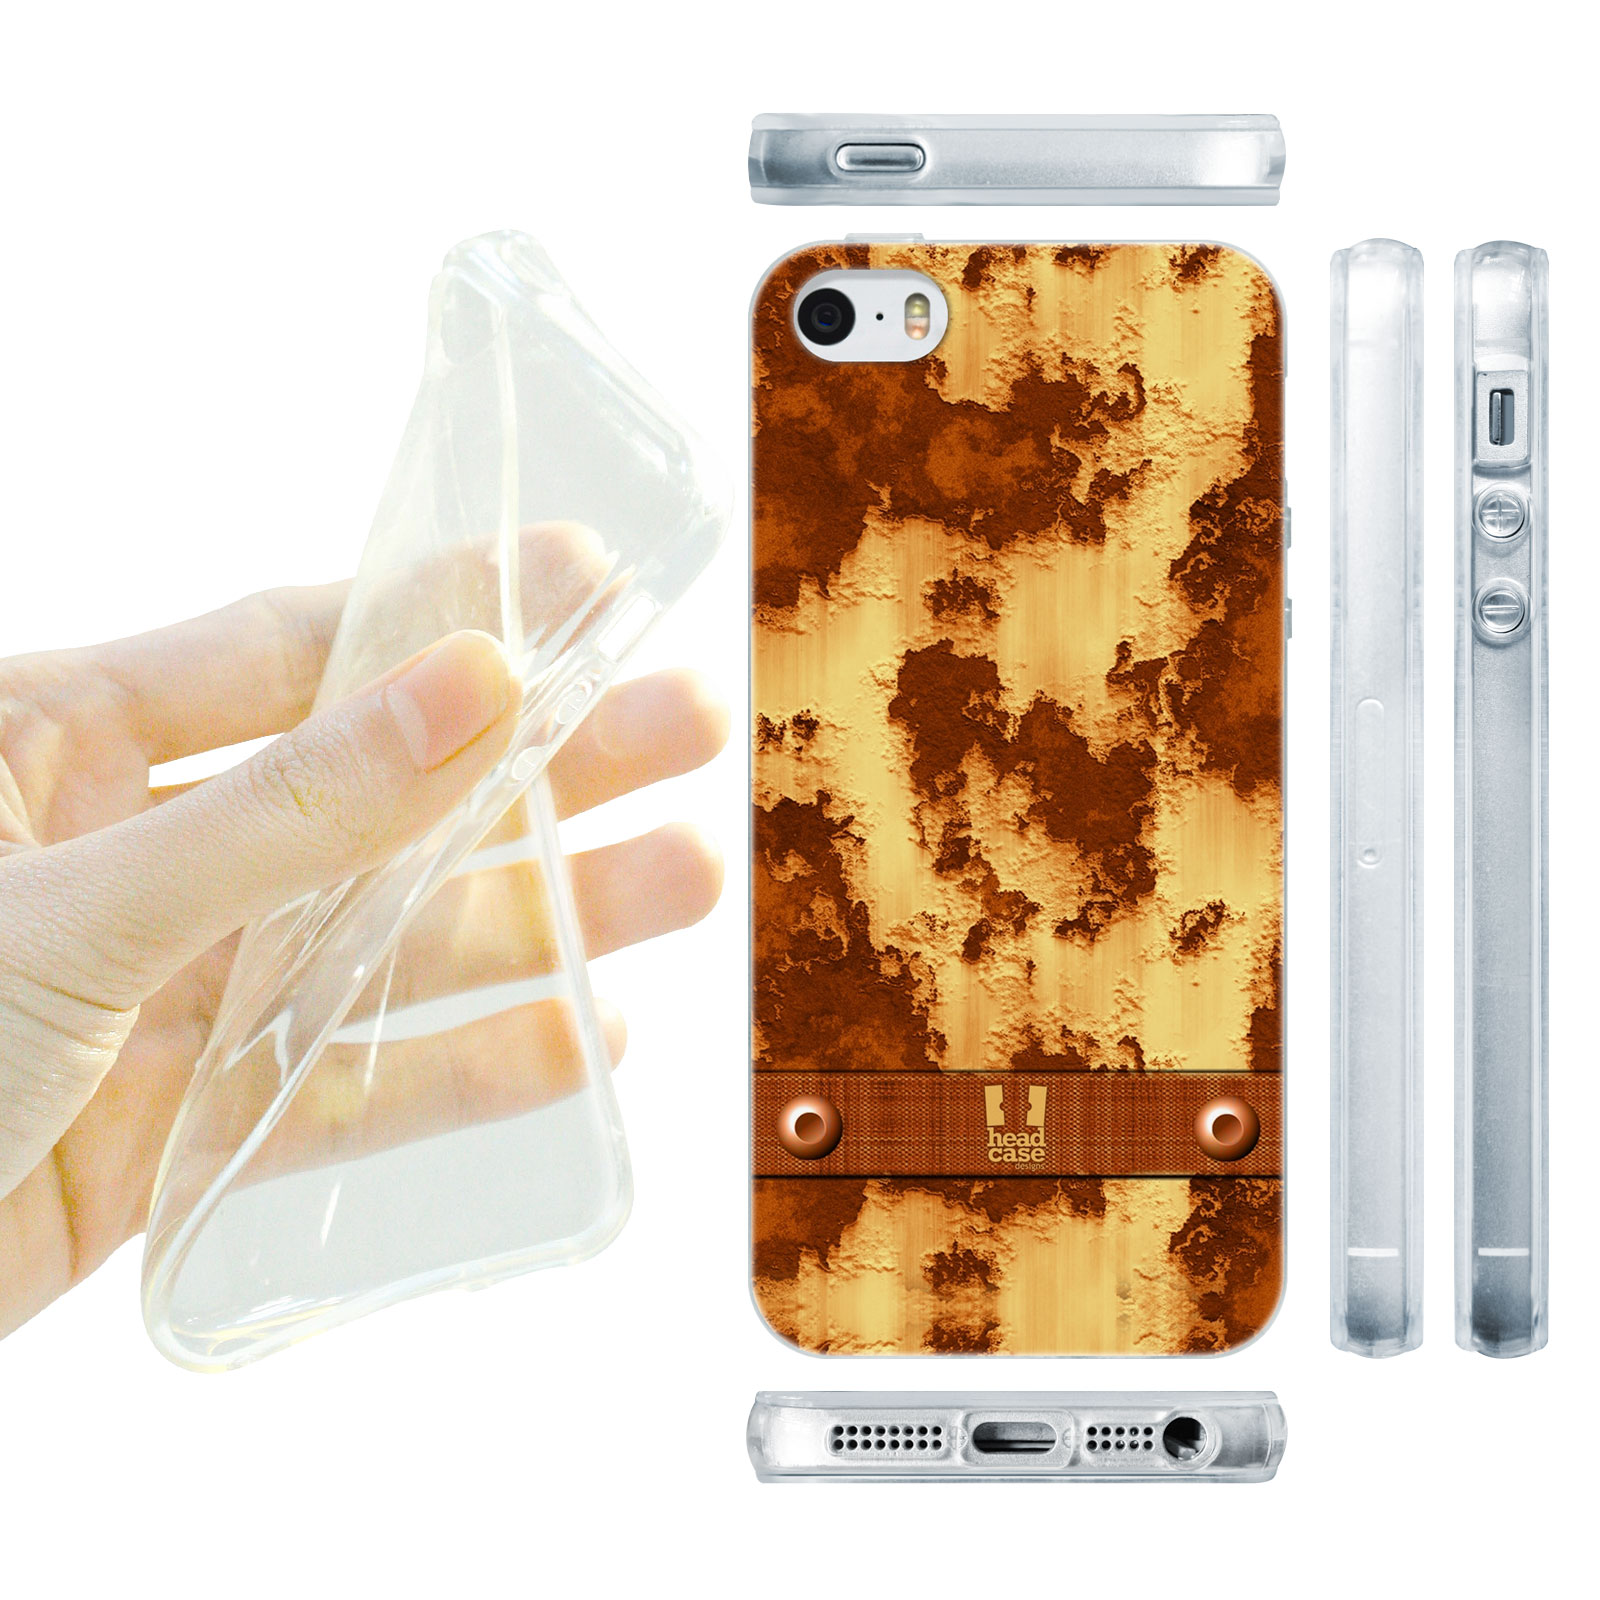 HEAD CASE silikonový obal na mobil Iphone 5/5S imitace železo rezavé hnědá barva